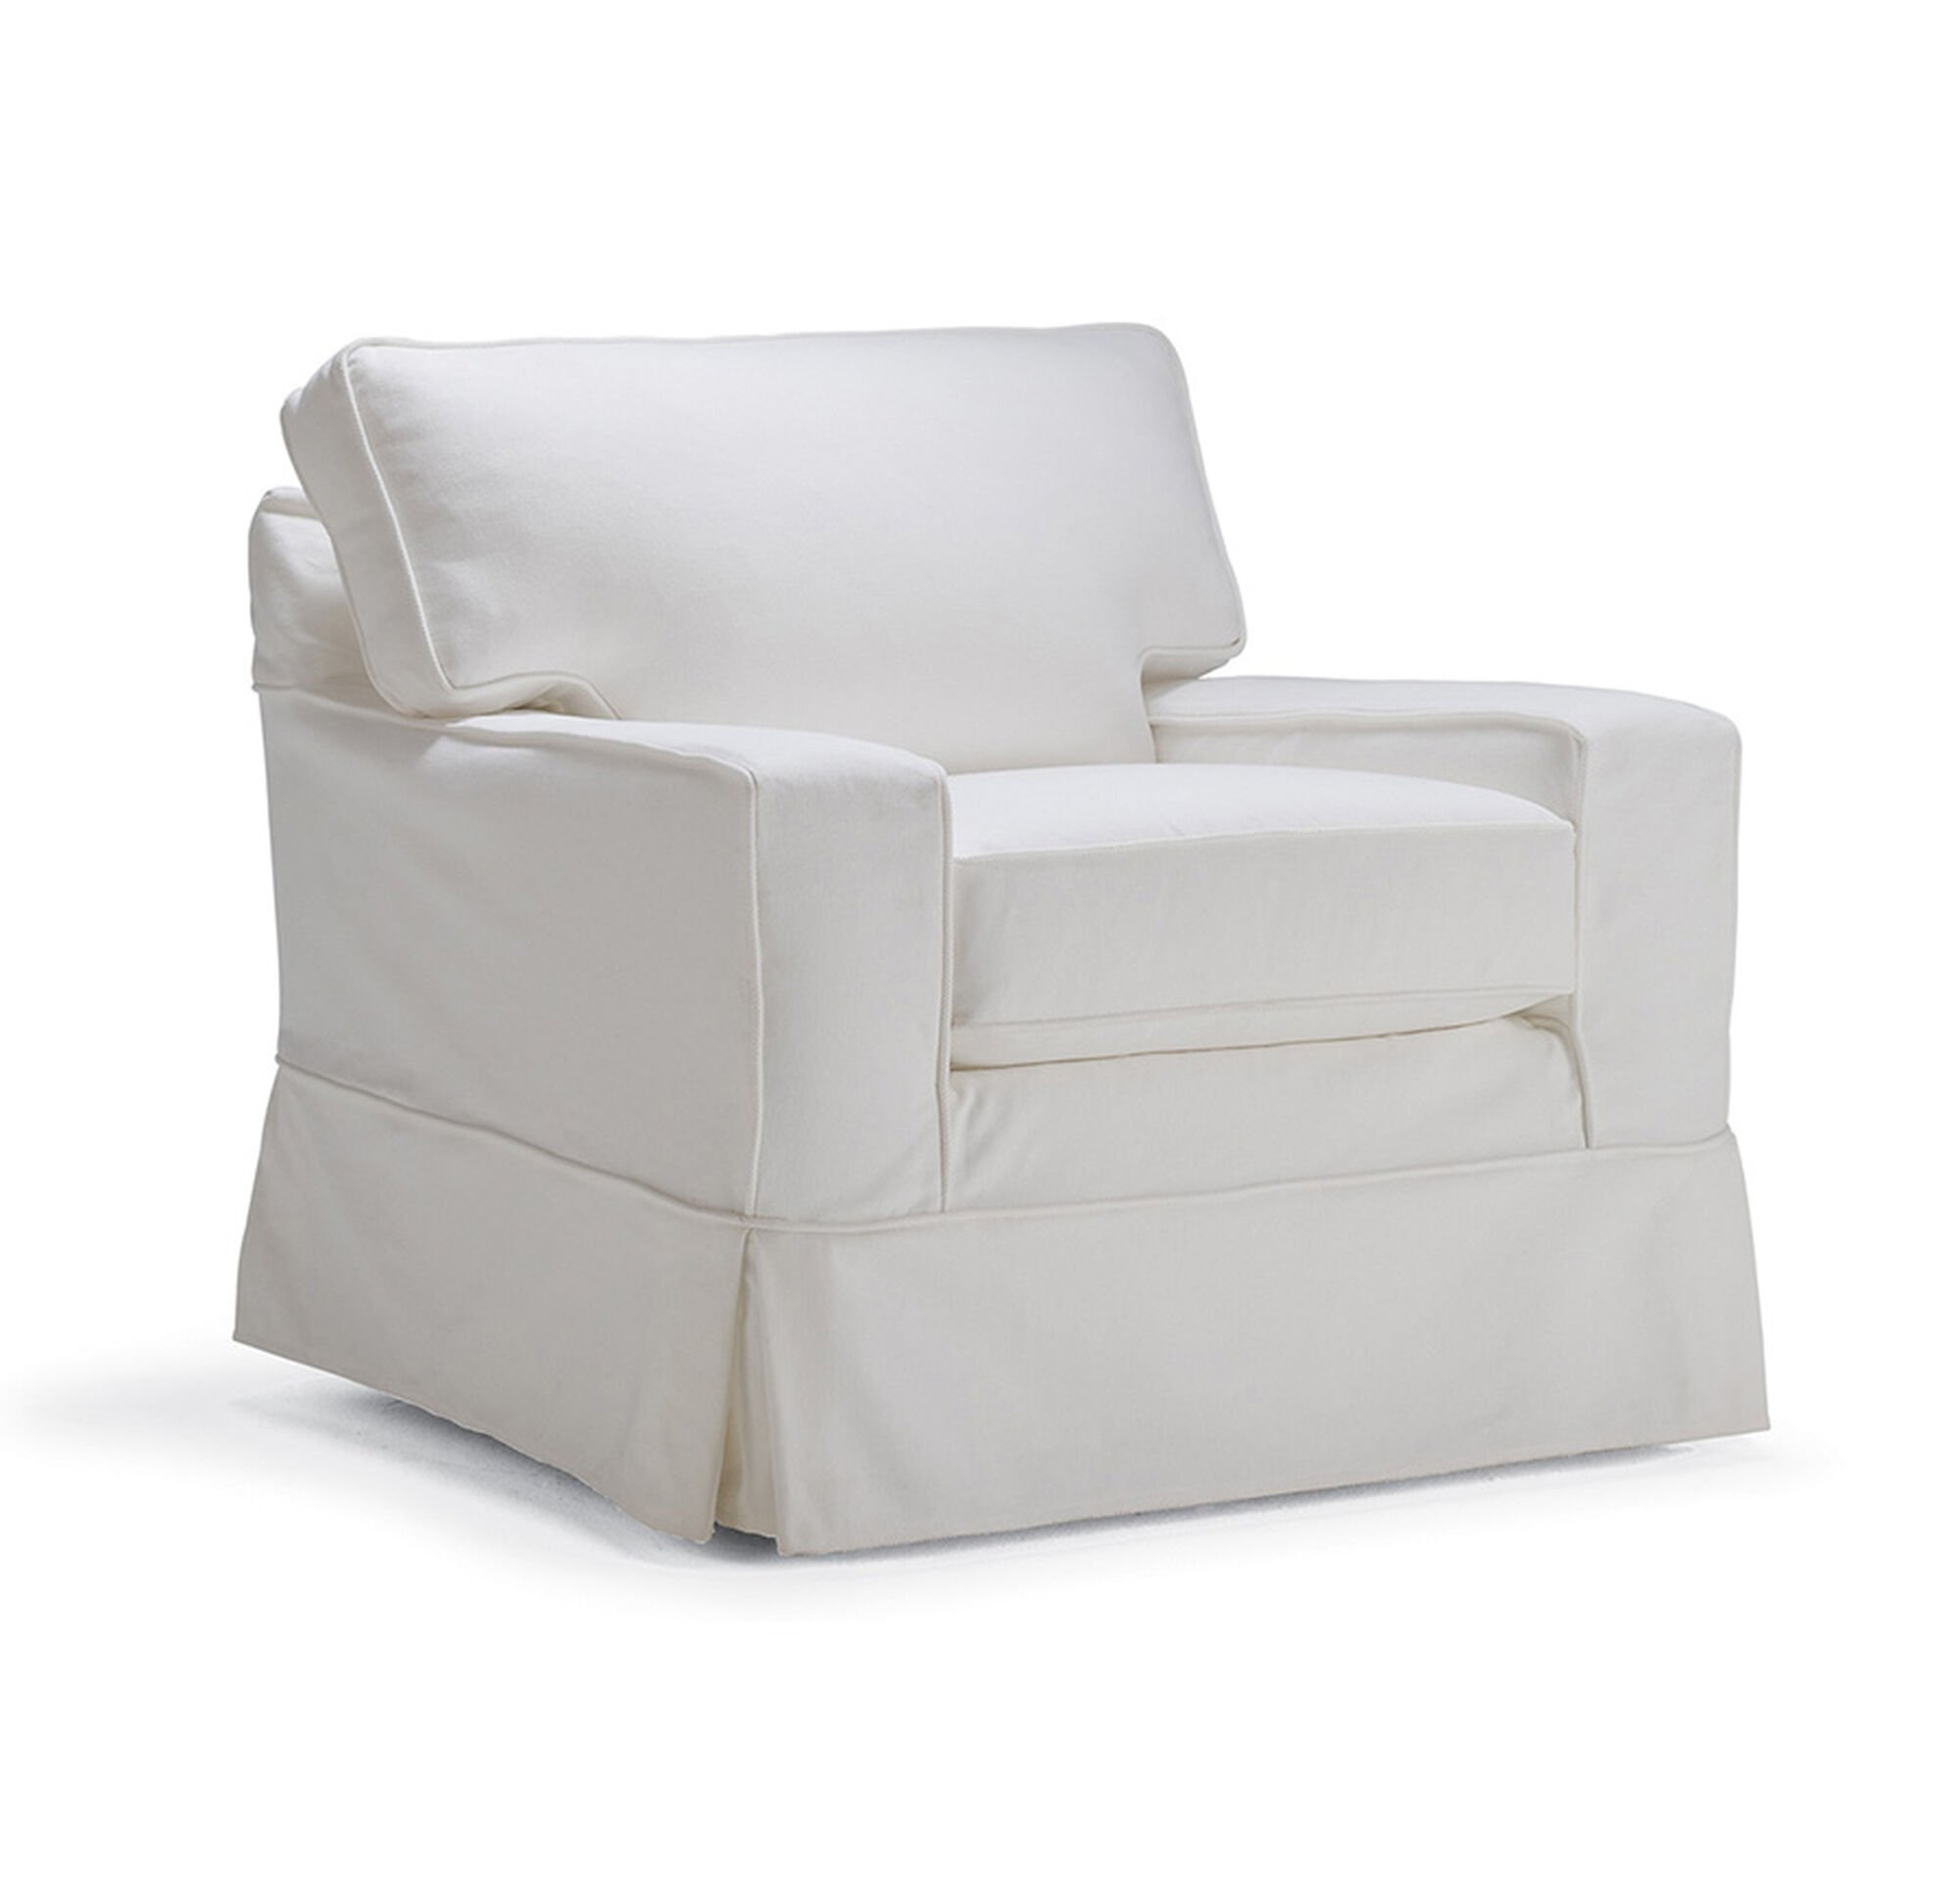 Brilliant Alex Ii Swivel Glider Chair Slipcover Spiritservingveterans Wood Chair Design Ideas Spiritservingveteransorg